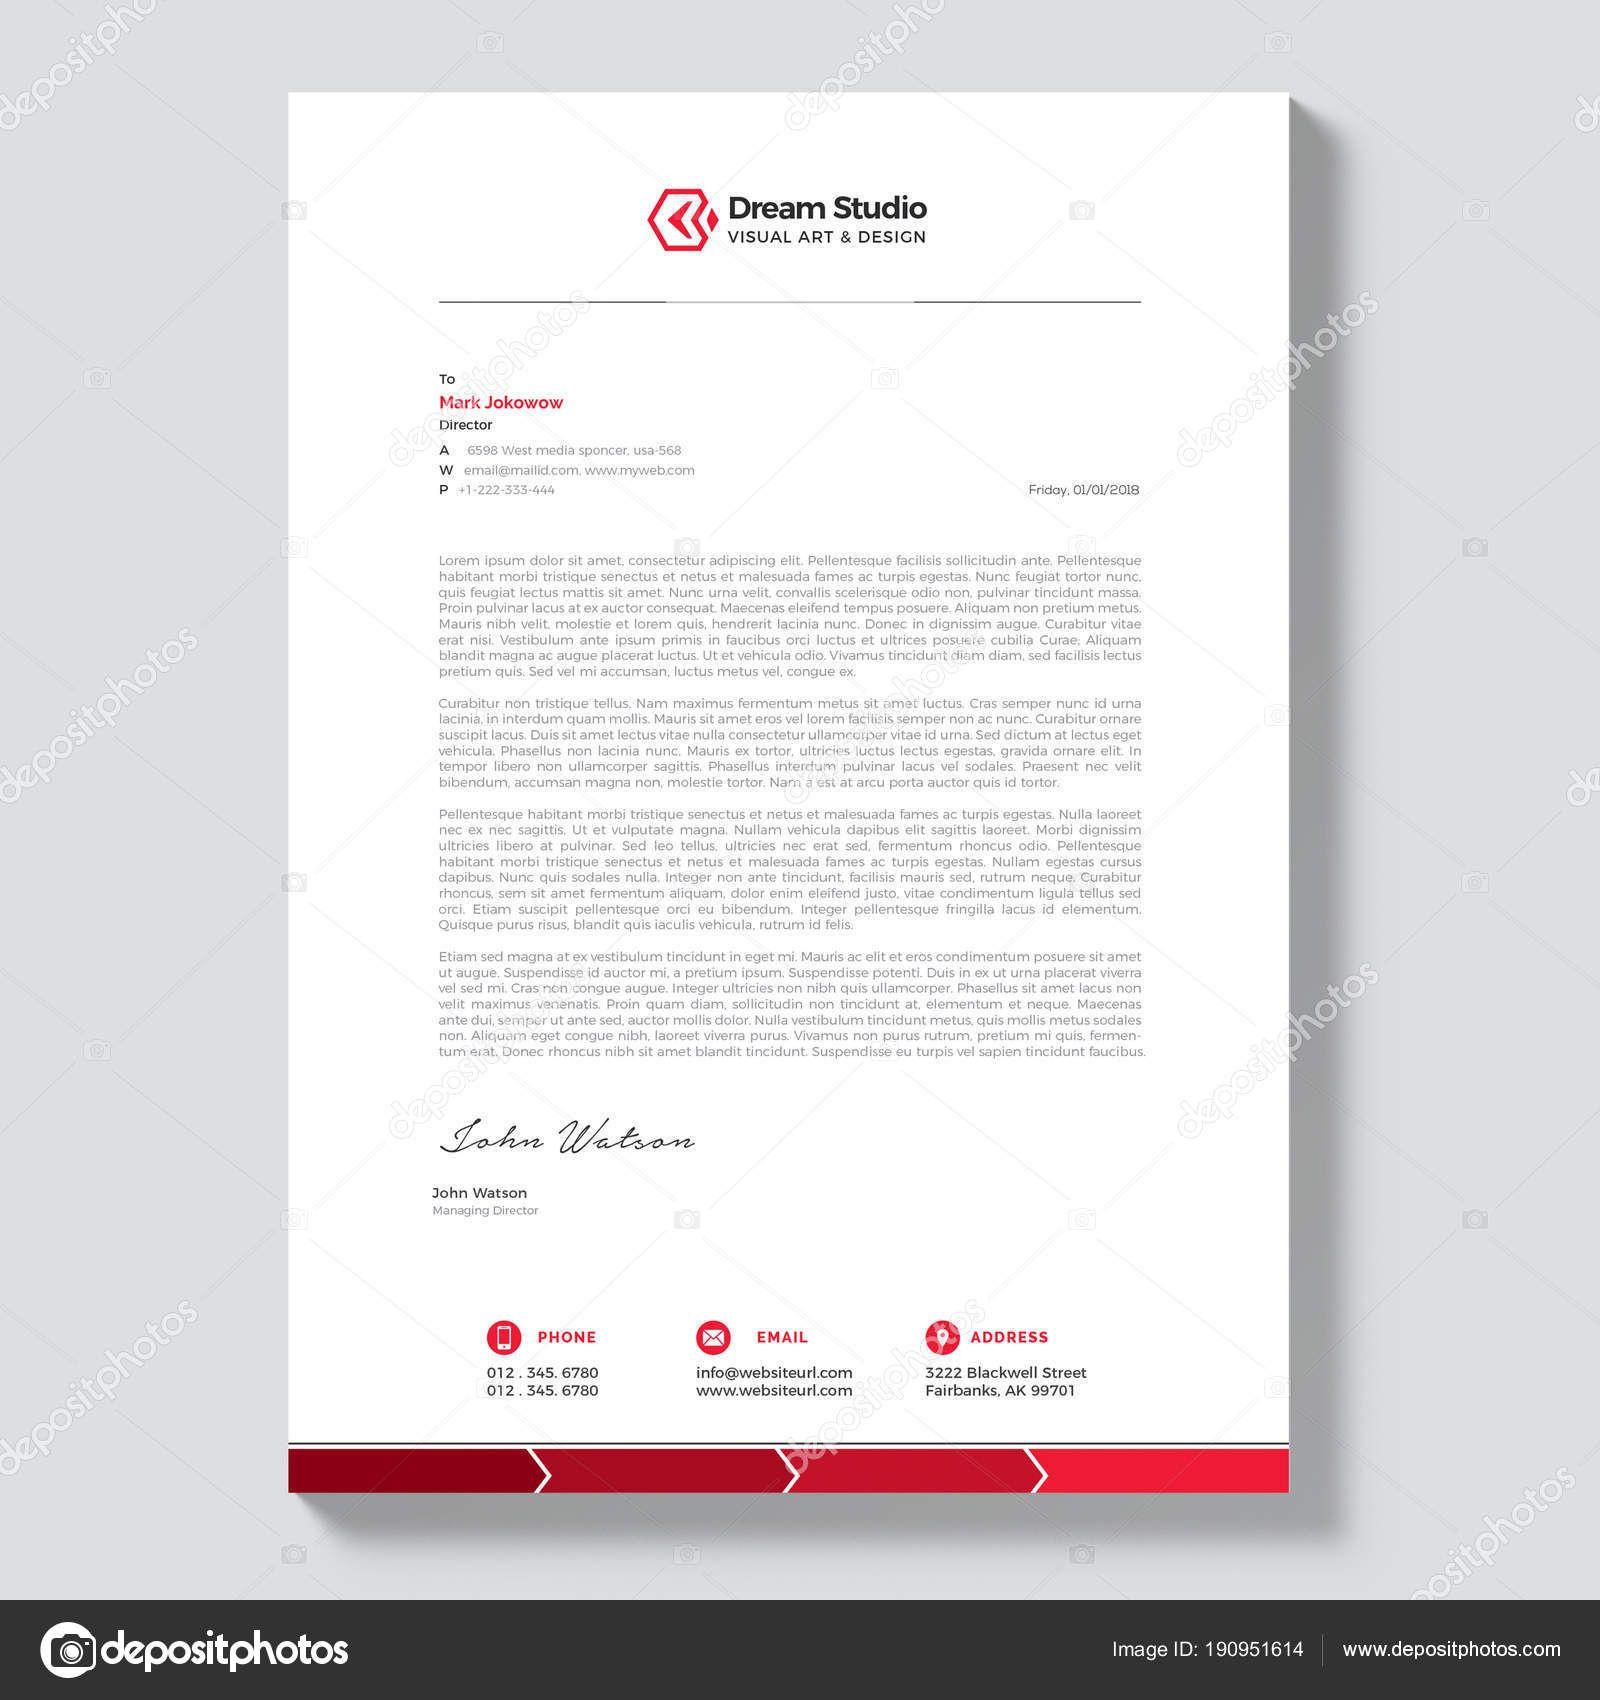 Alastor Professional Corporate Letterhead Template 001026: Modern Company Letterhead Template